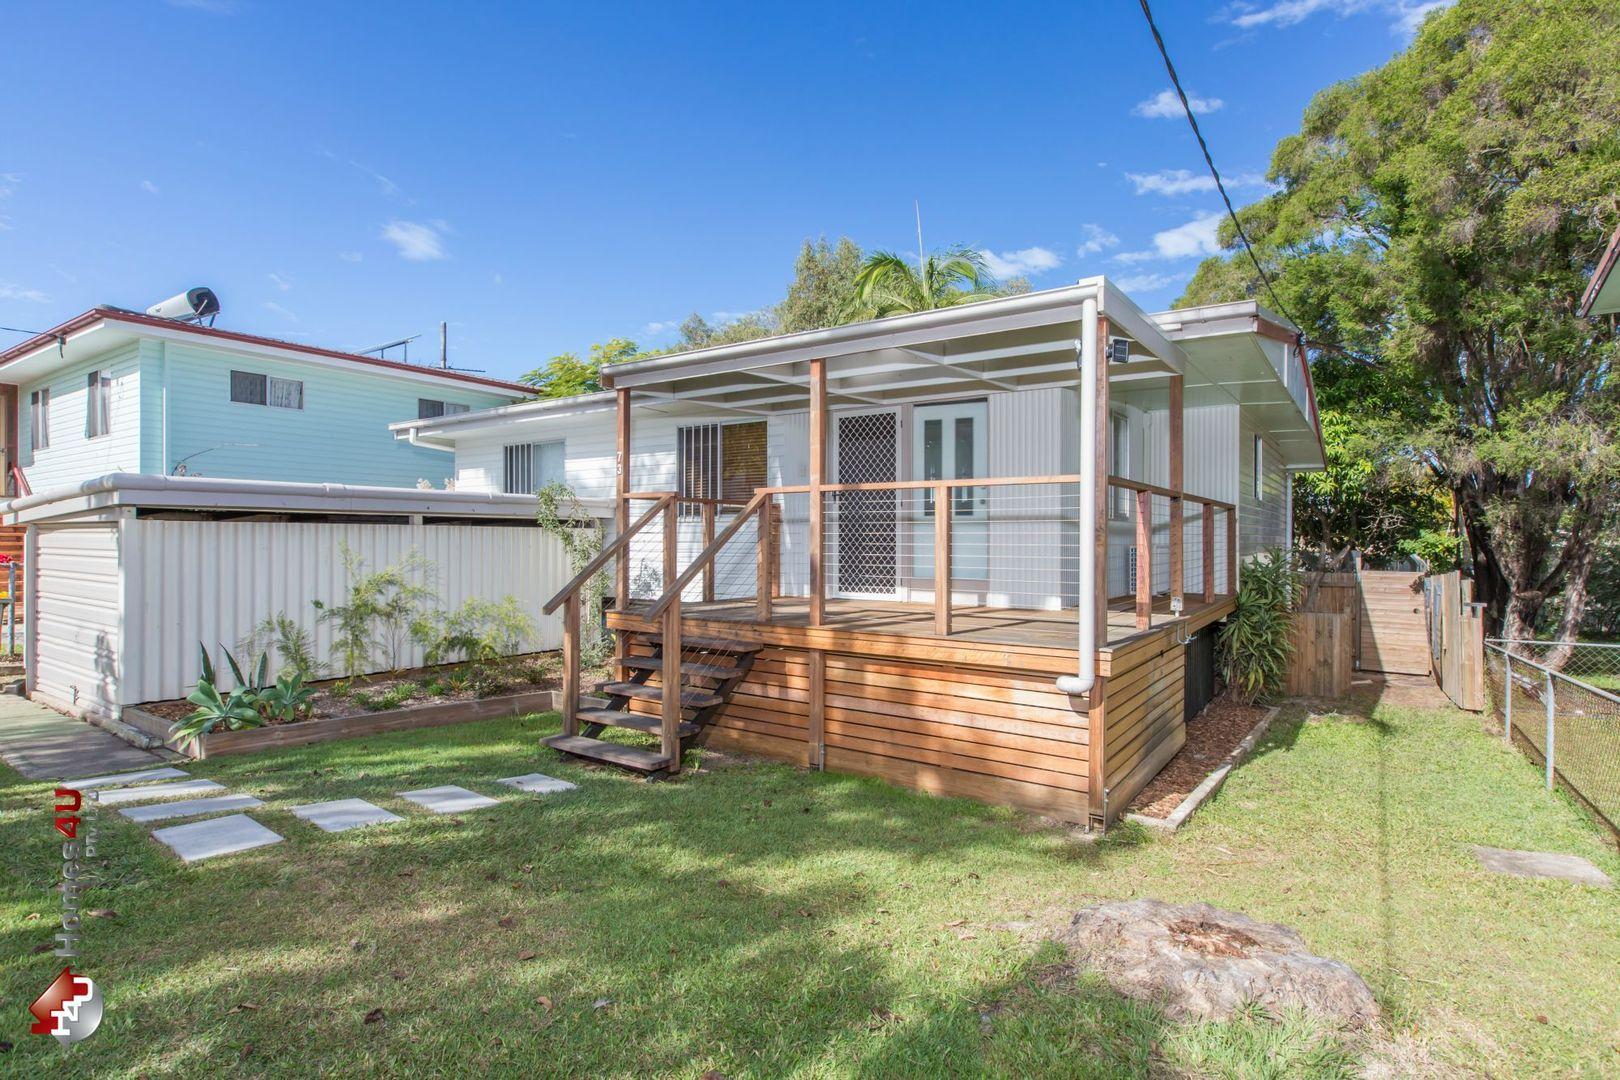 73 Cutts Street, Margate QLD 4019, Image 1